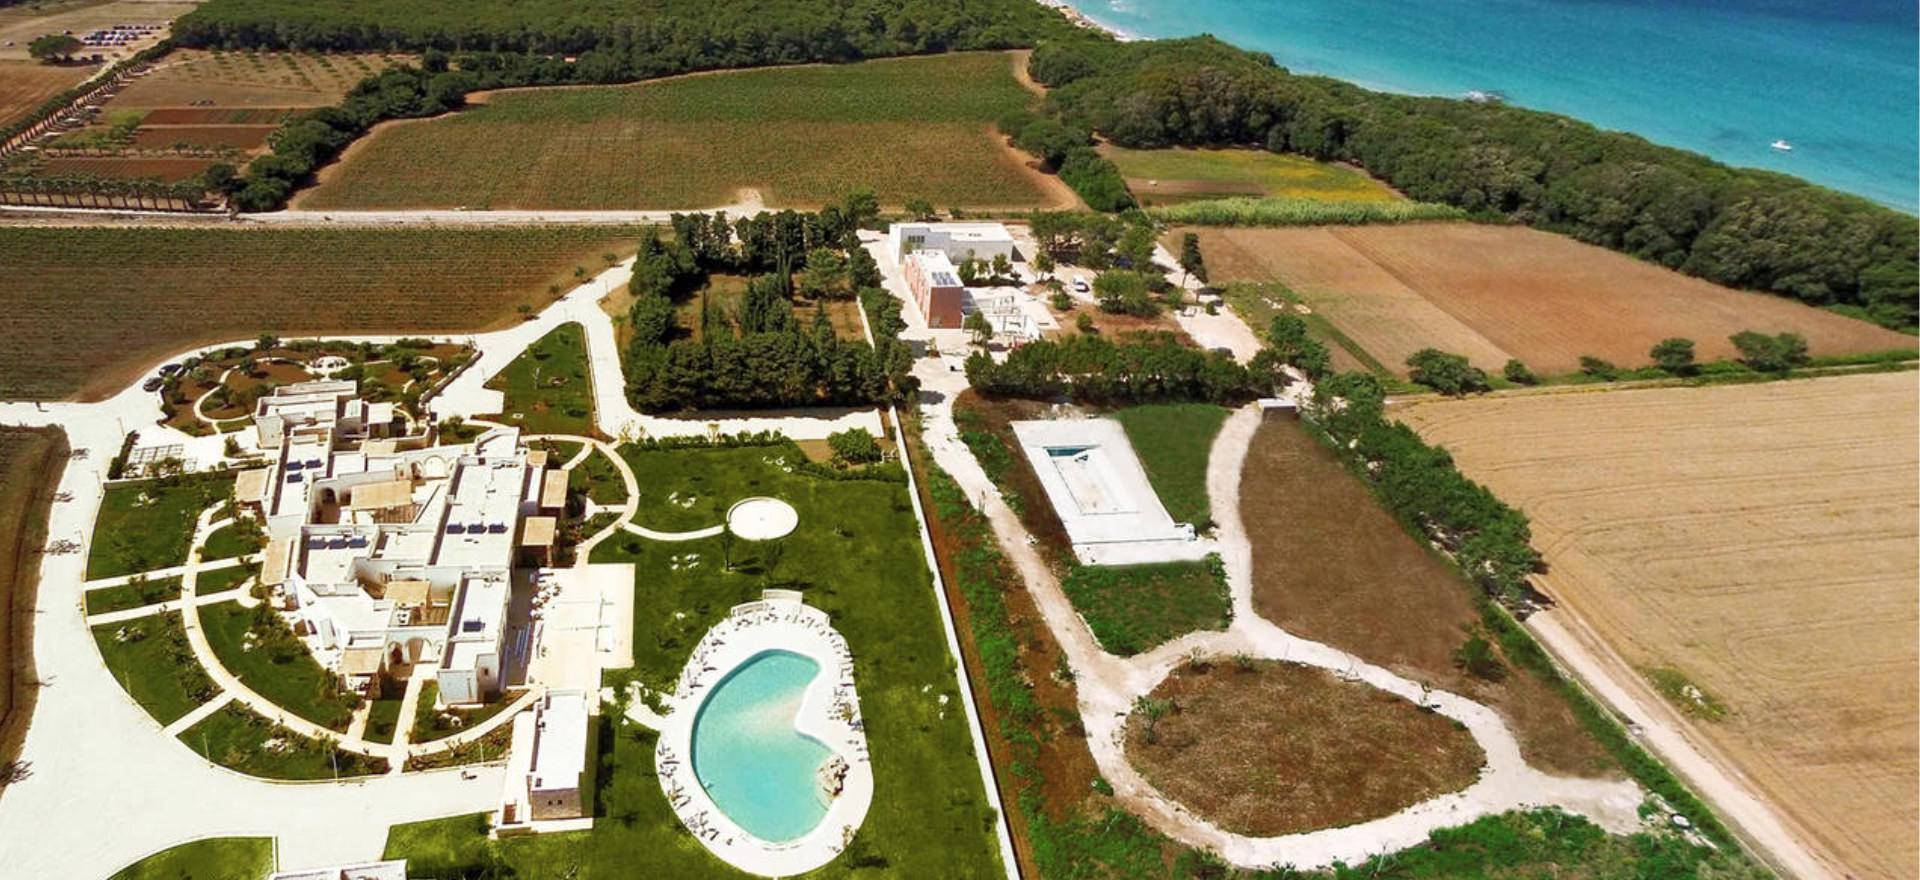 Agriturismo Apulien Luxus-Agriturismo in Apulien, in der Nähe des Meeres